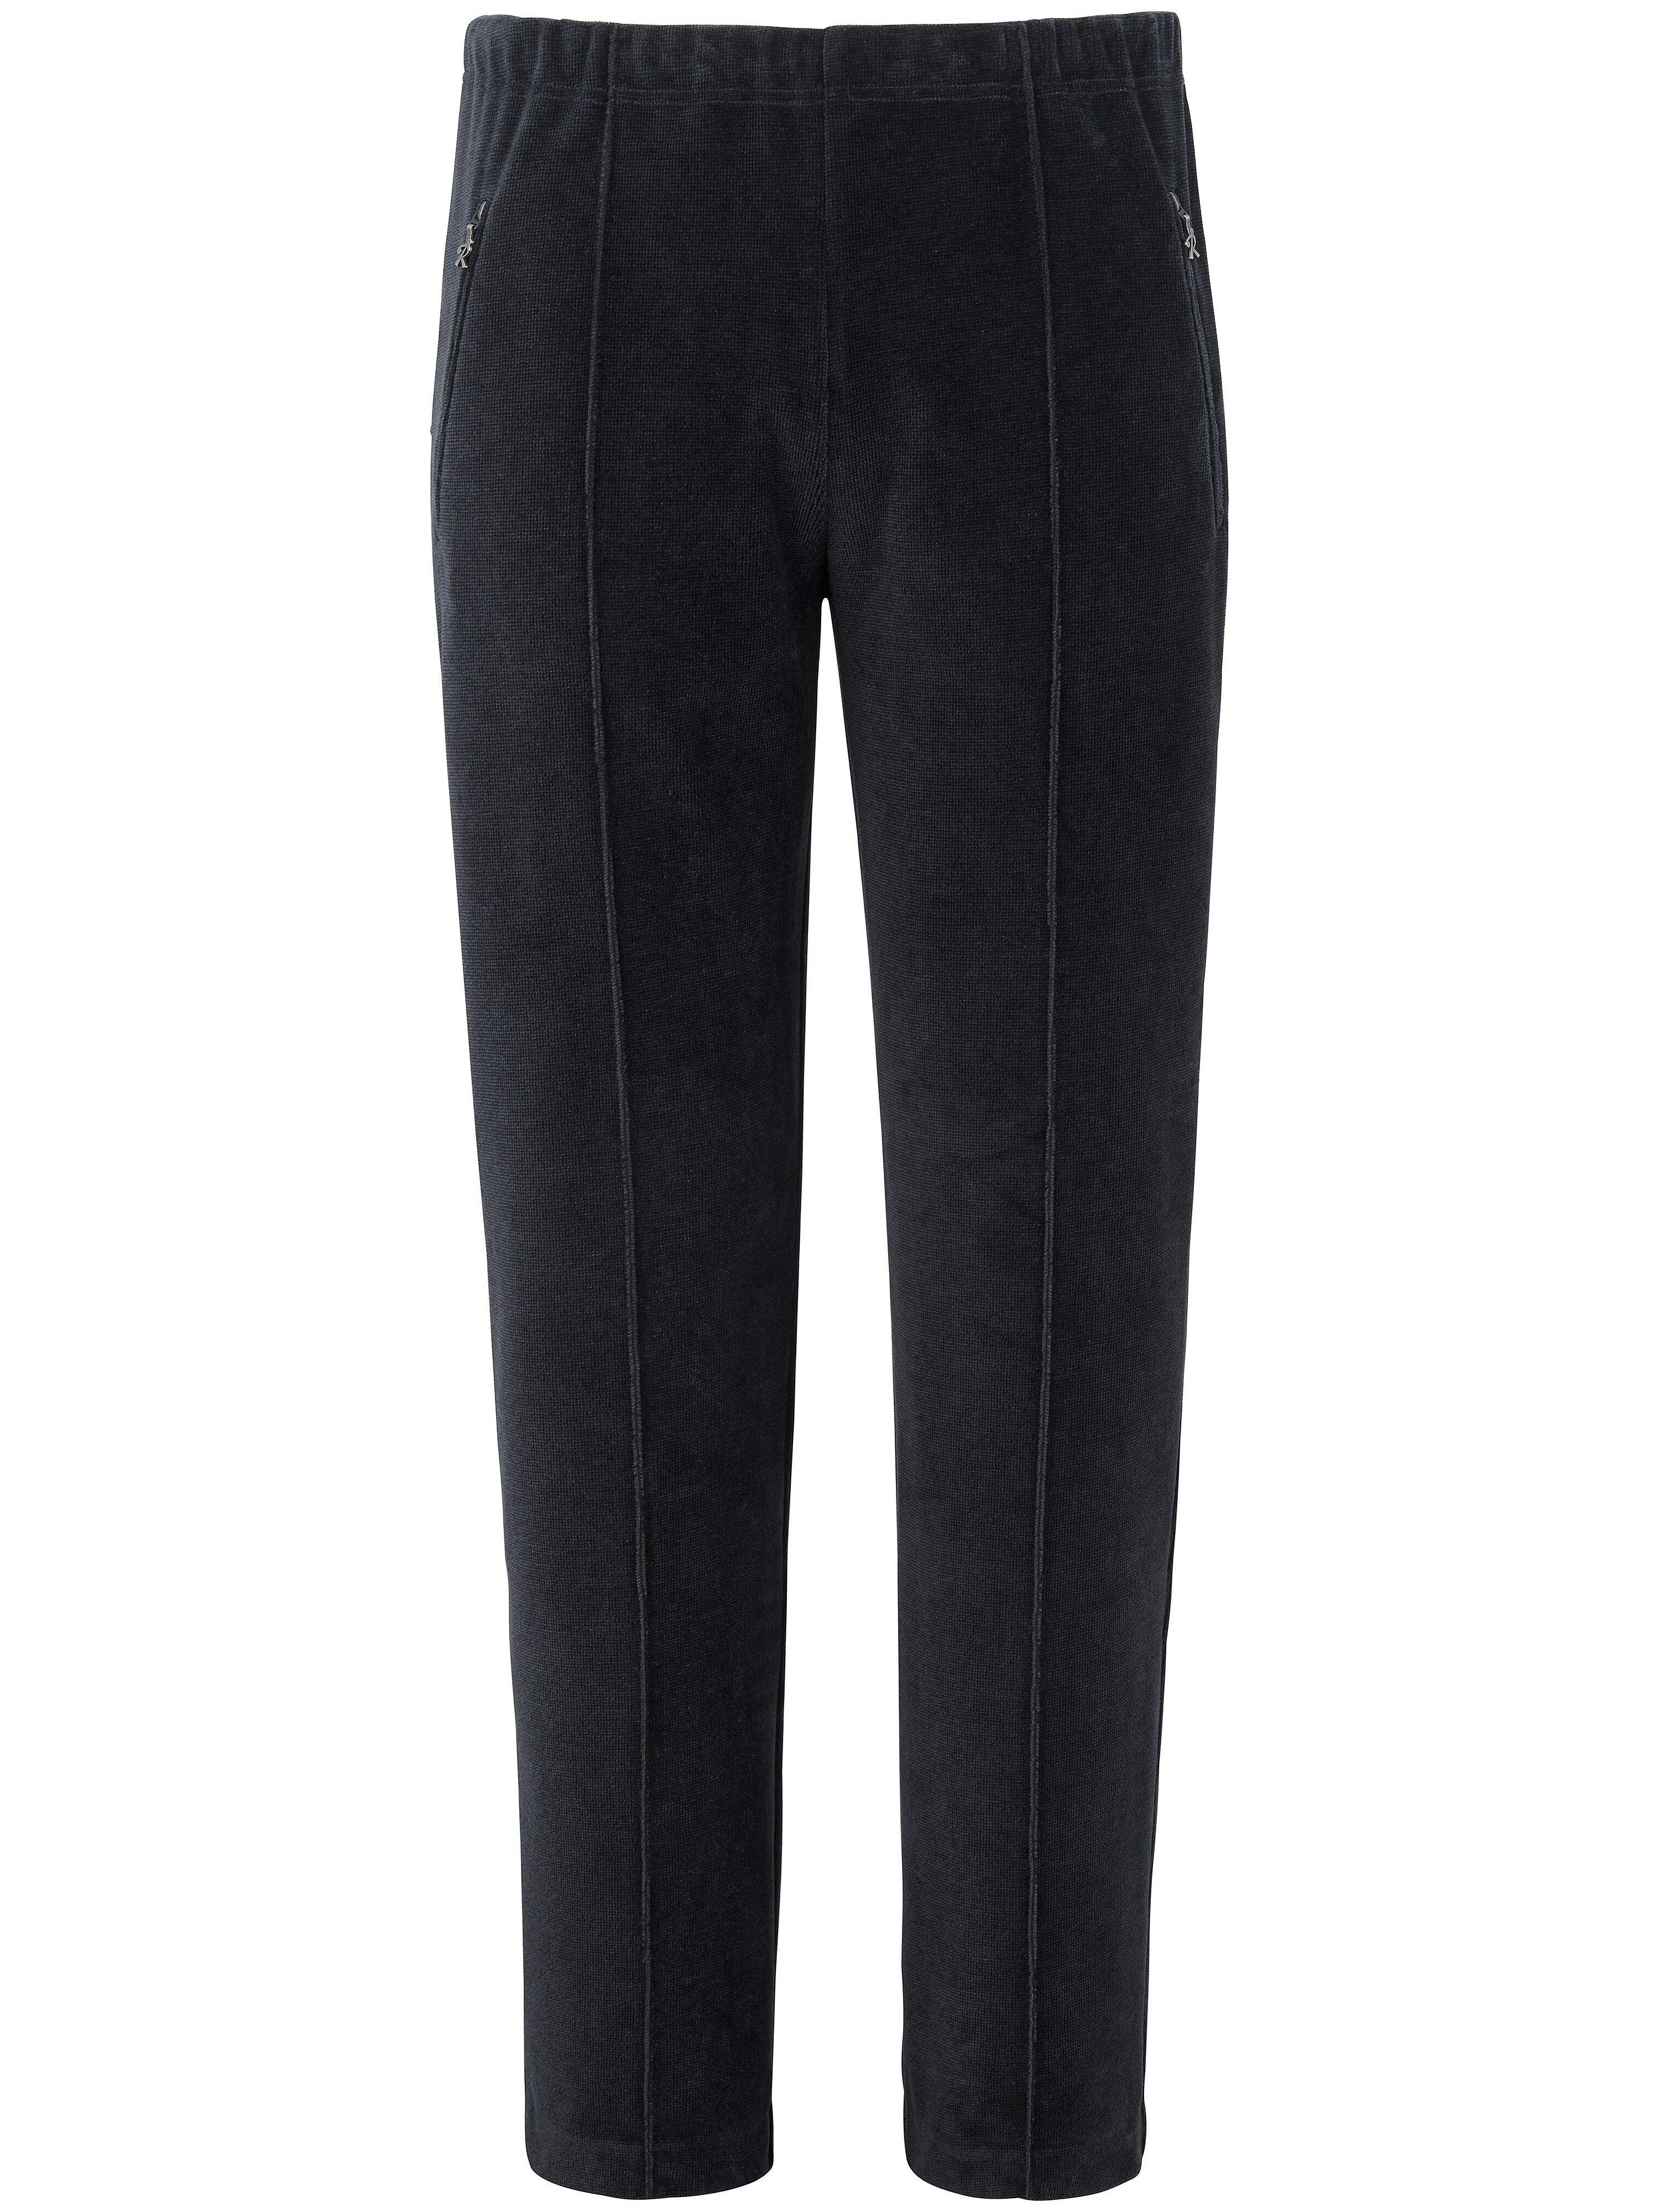 Wellness trousers Ruff grey